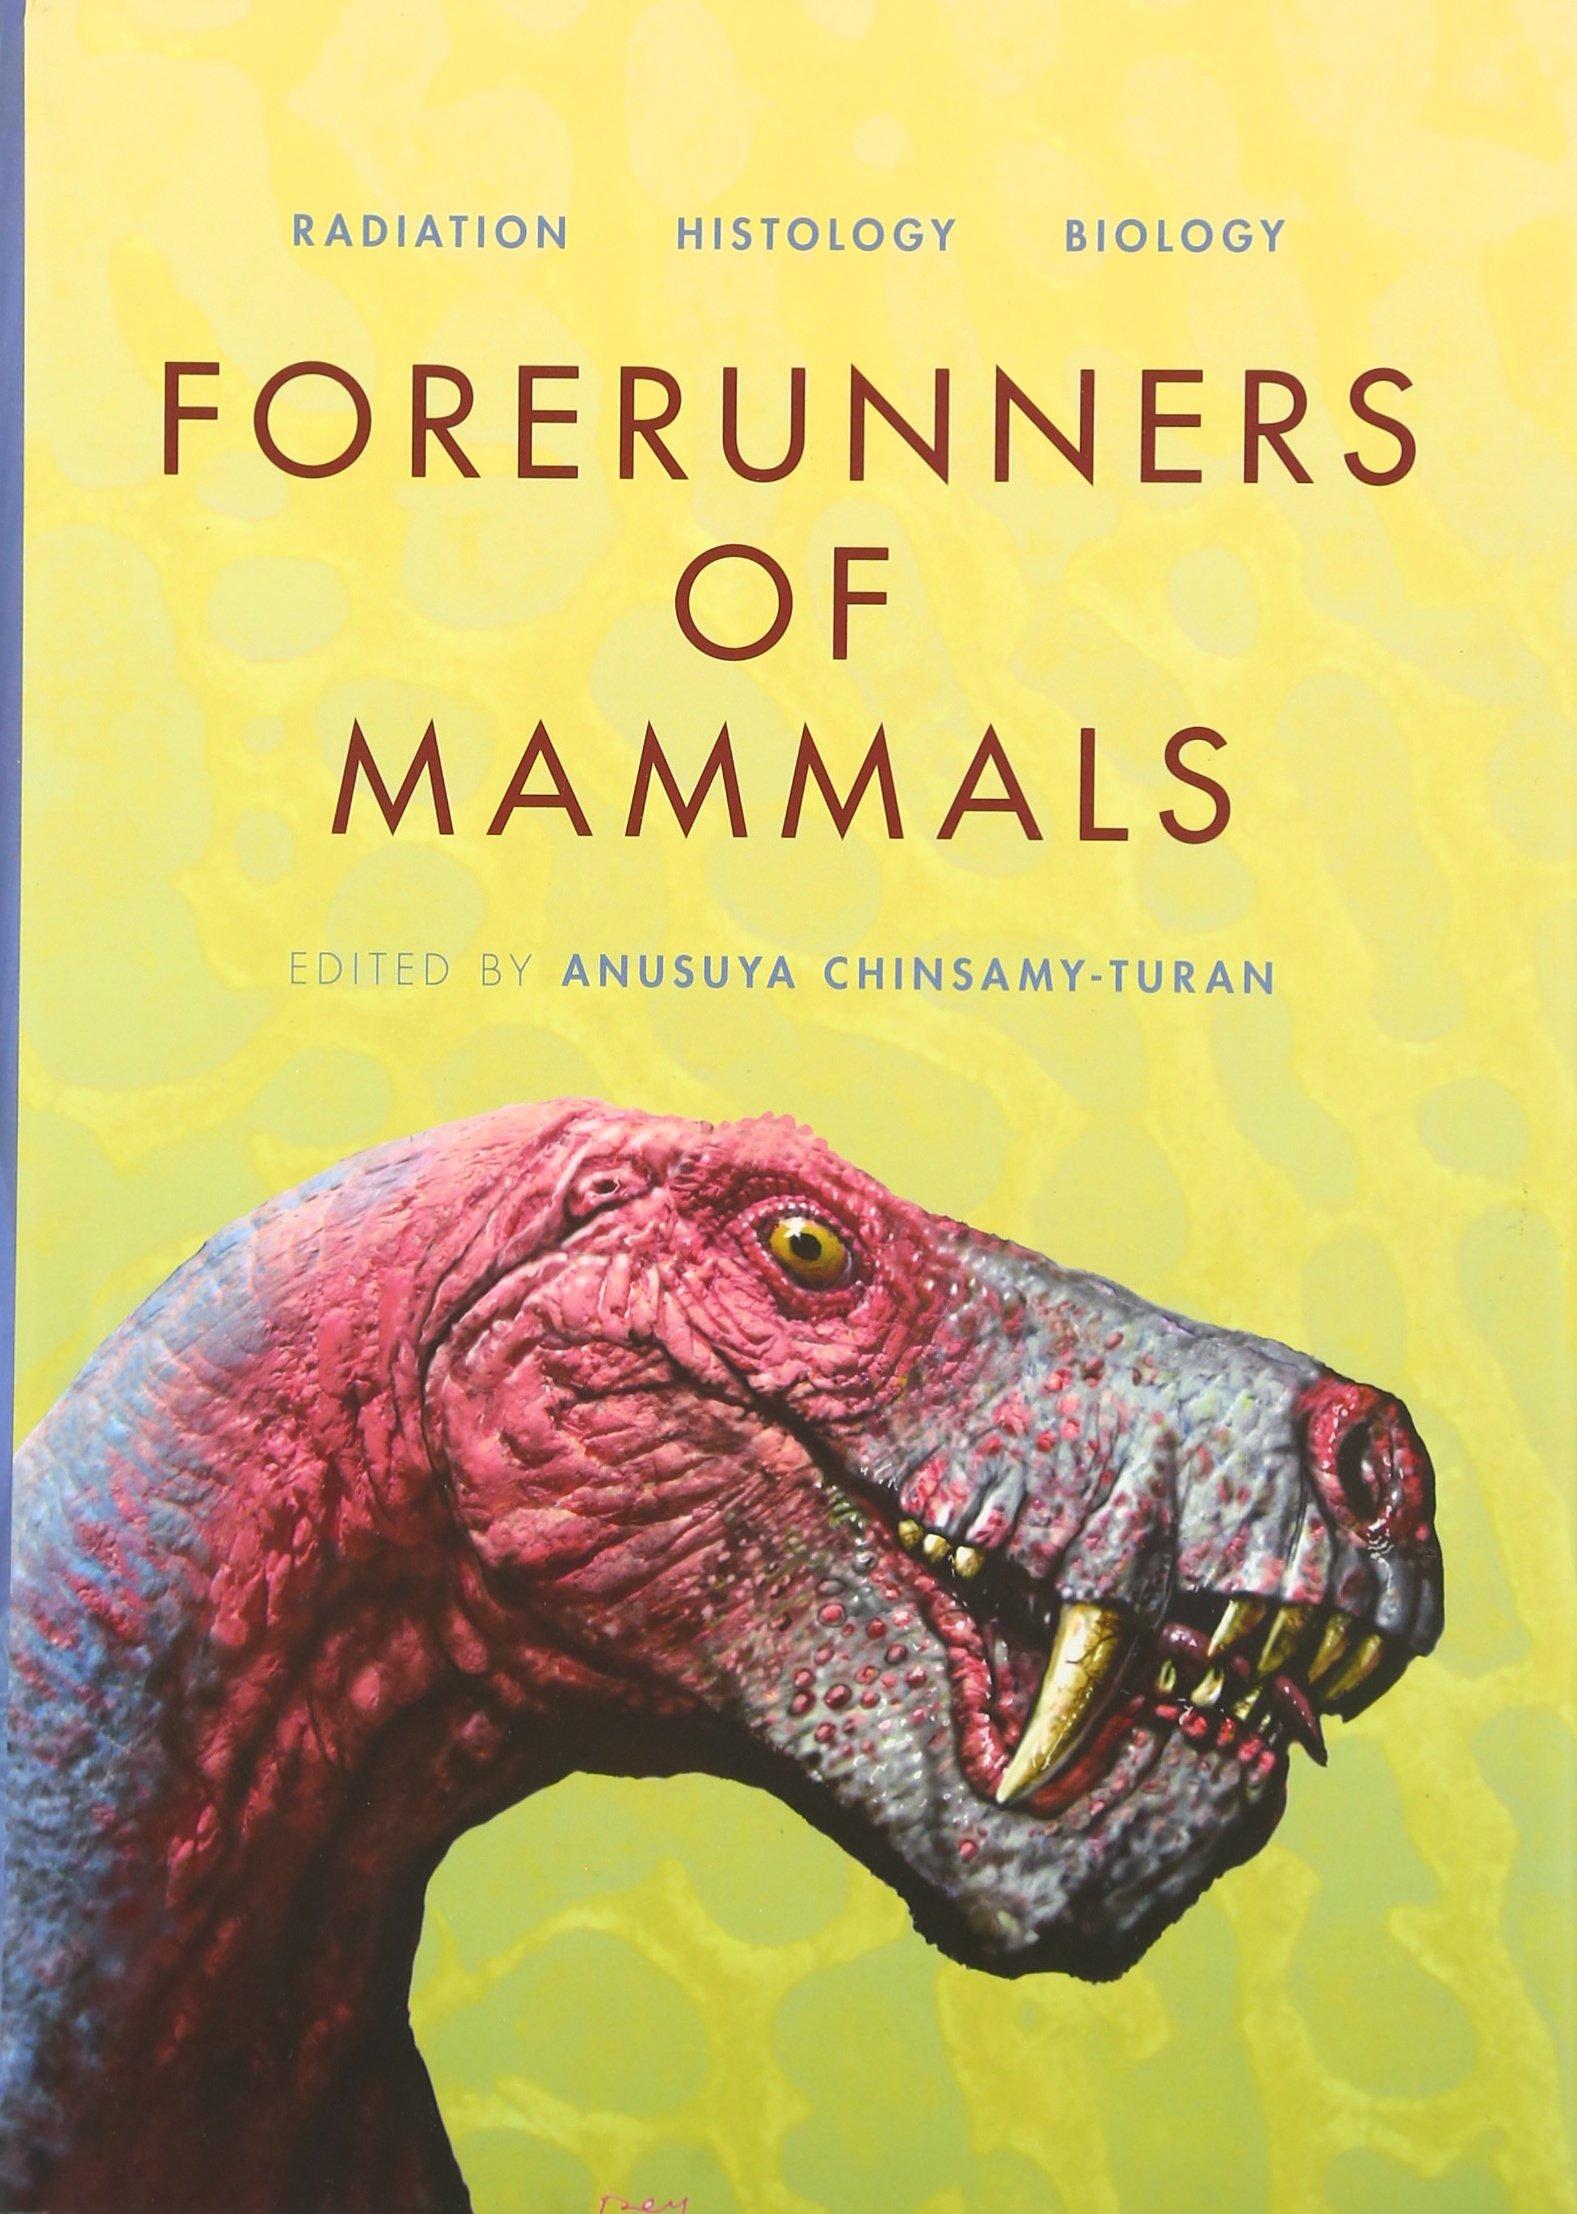 Forerunners of mammals radiation histology biology life of the past amazon co uk anusuya chinsamy turan 9780253356970 books